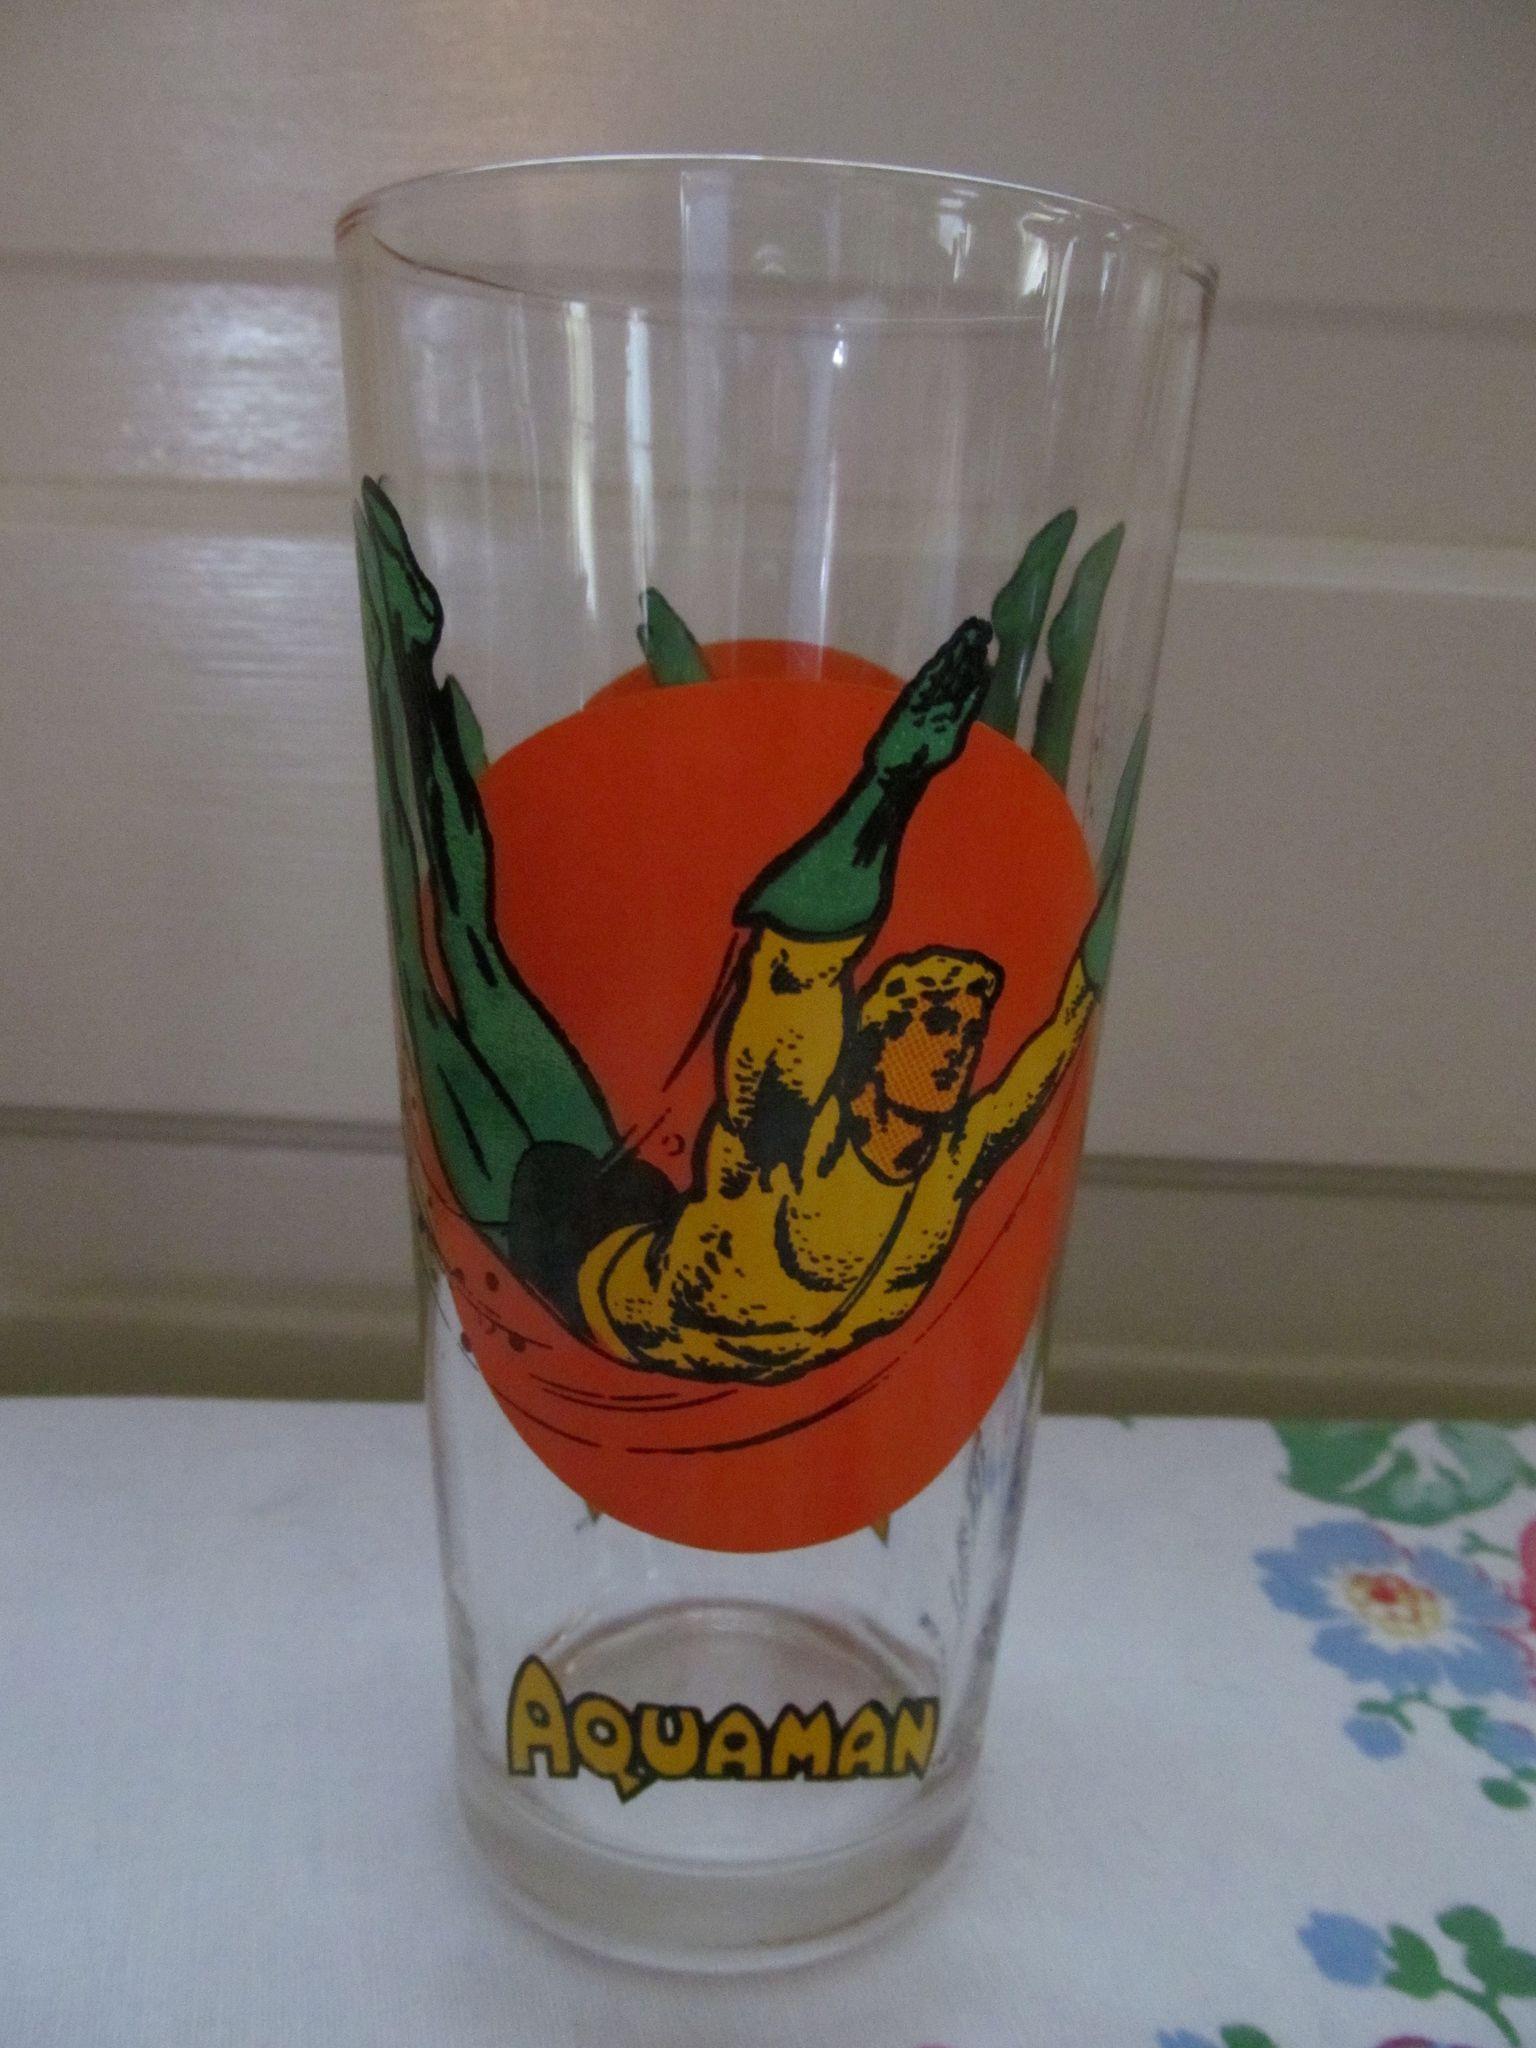 Aquaman 1976 Super Series DC Comics Promotional Drinking Glass